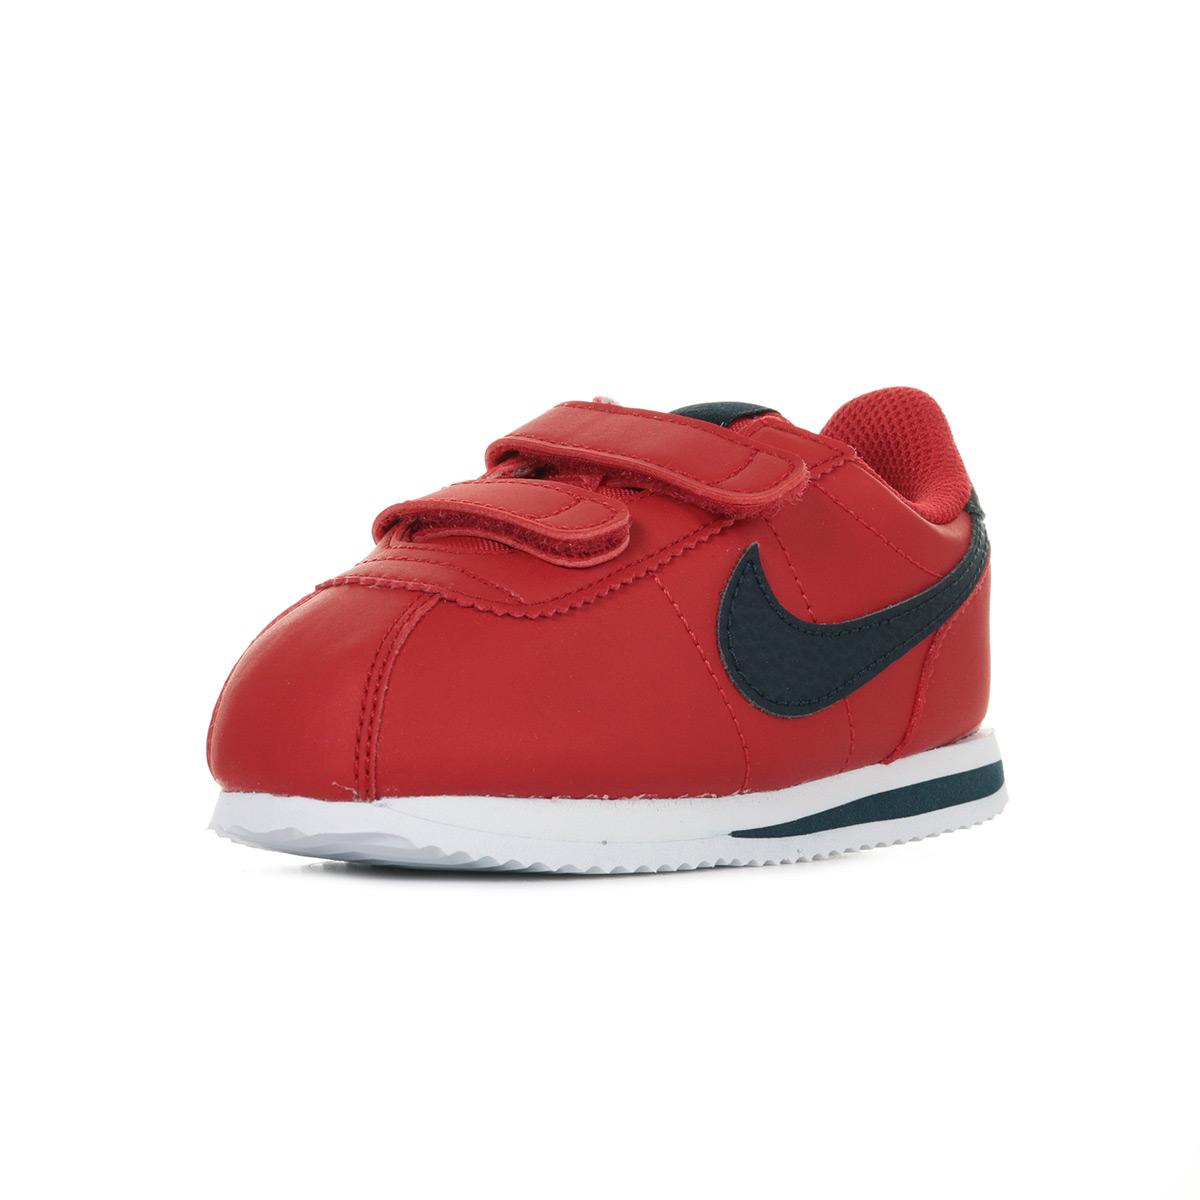 separation shoes f5b24 c13fa Nike Cortez Basic SL (TDV) ...